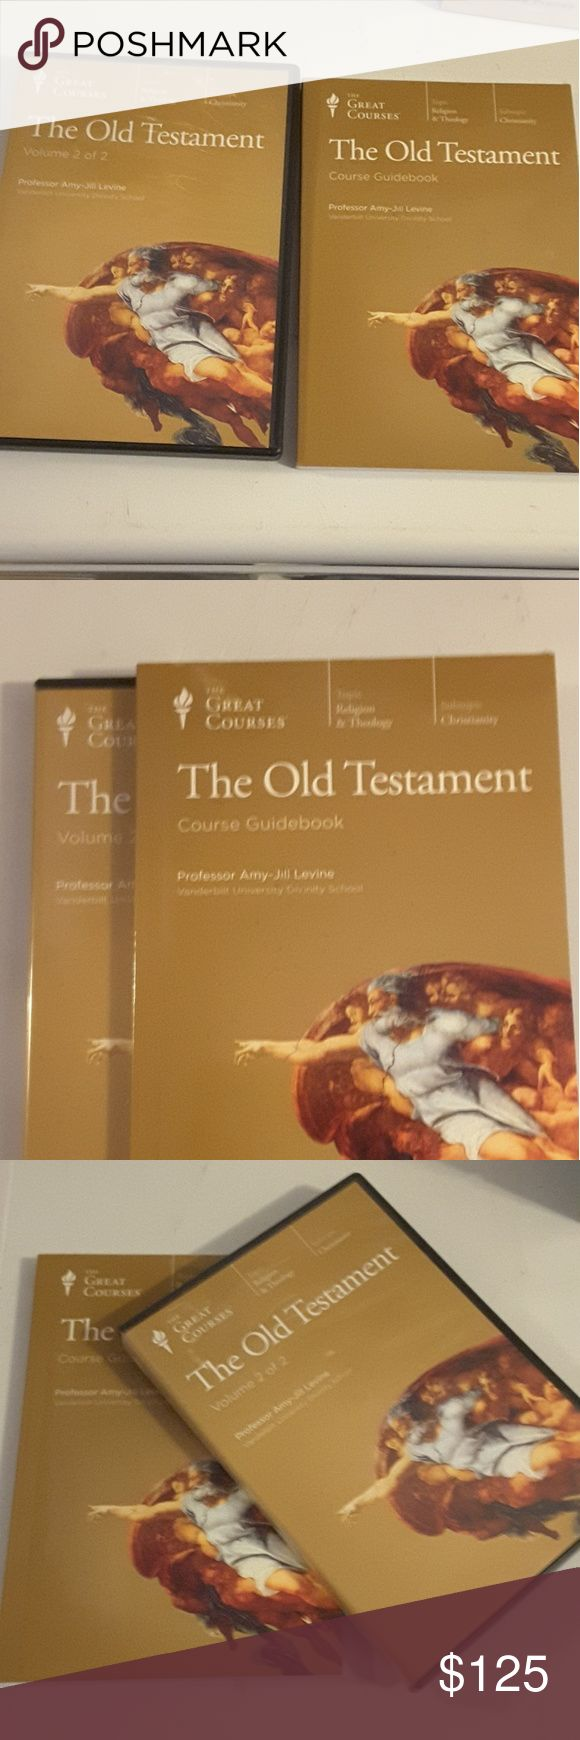 OLD TESTERMENT Course Guide Book and 12 Cds Professor Amy-Jill Levine Ph. D. Vanderbilt University Old Testament 12 CDs and Course Guide Book Other